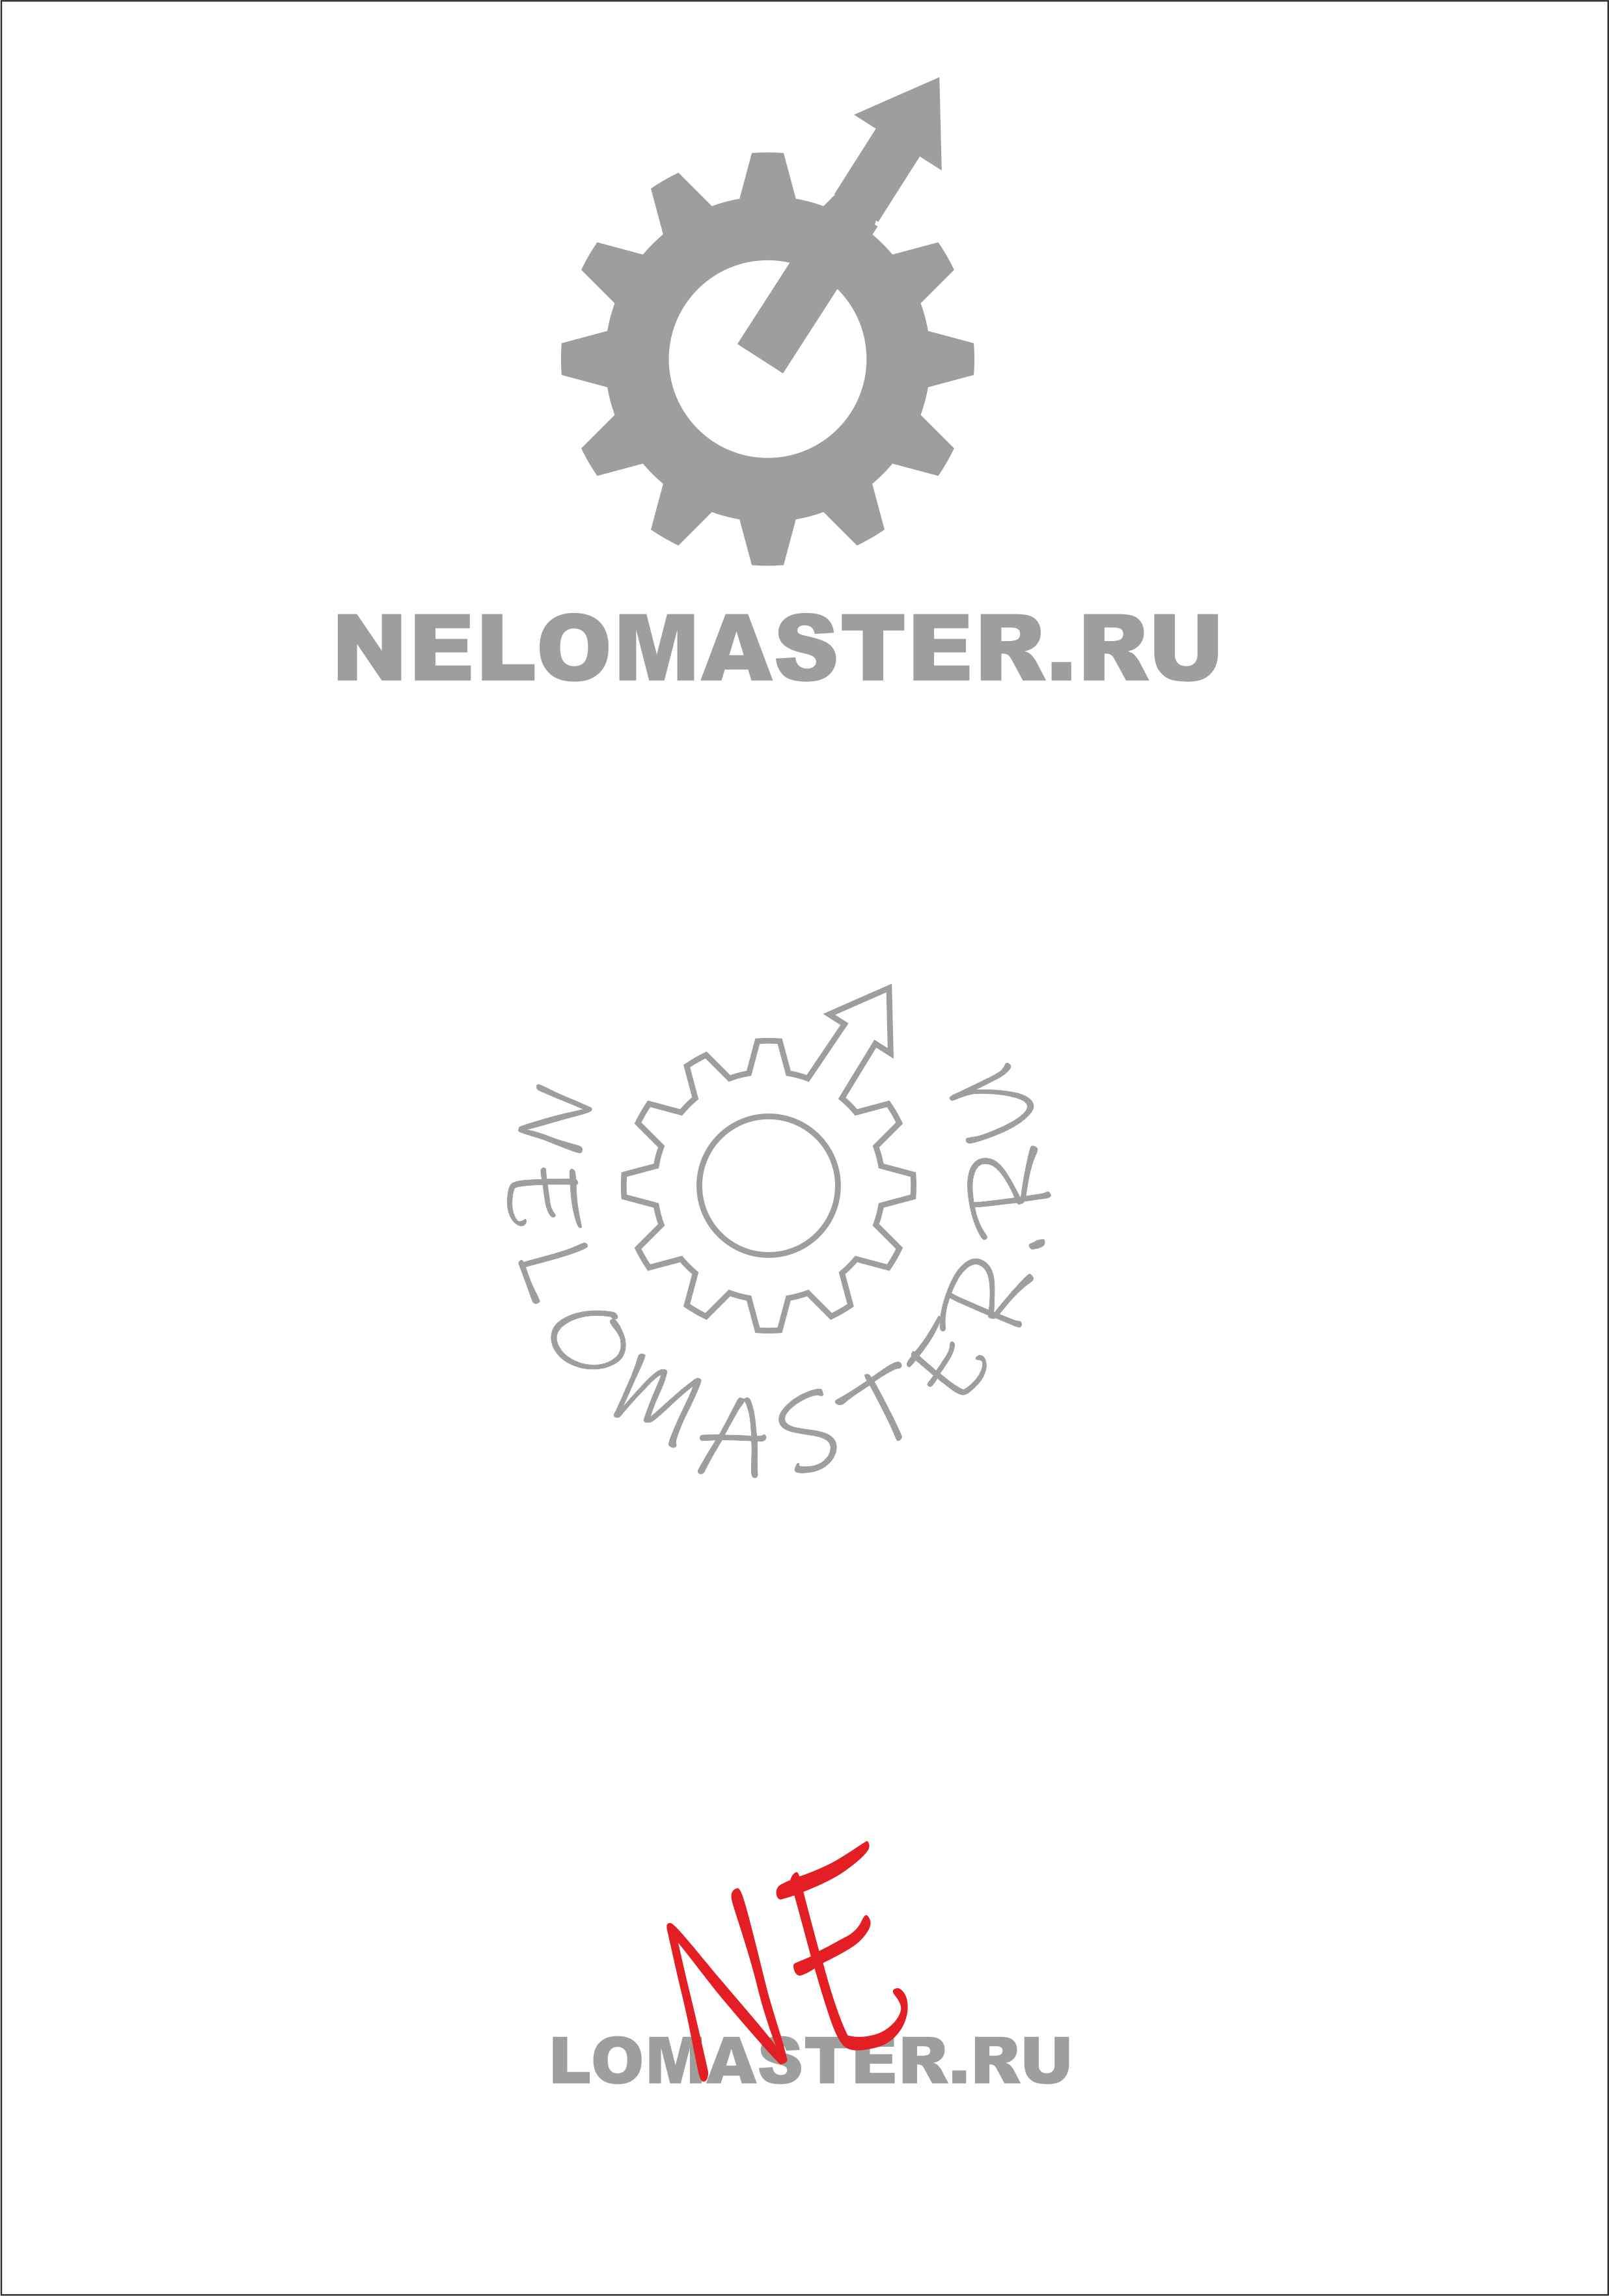 "Логотип сервиса ""Муж на час""=""Мужская помощь по дому"" фото f_6255dc4731db3030.jpg"